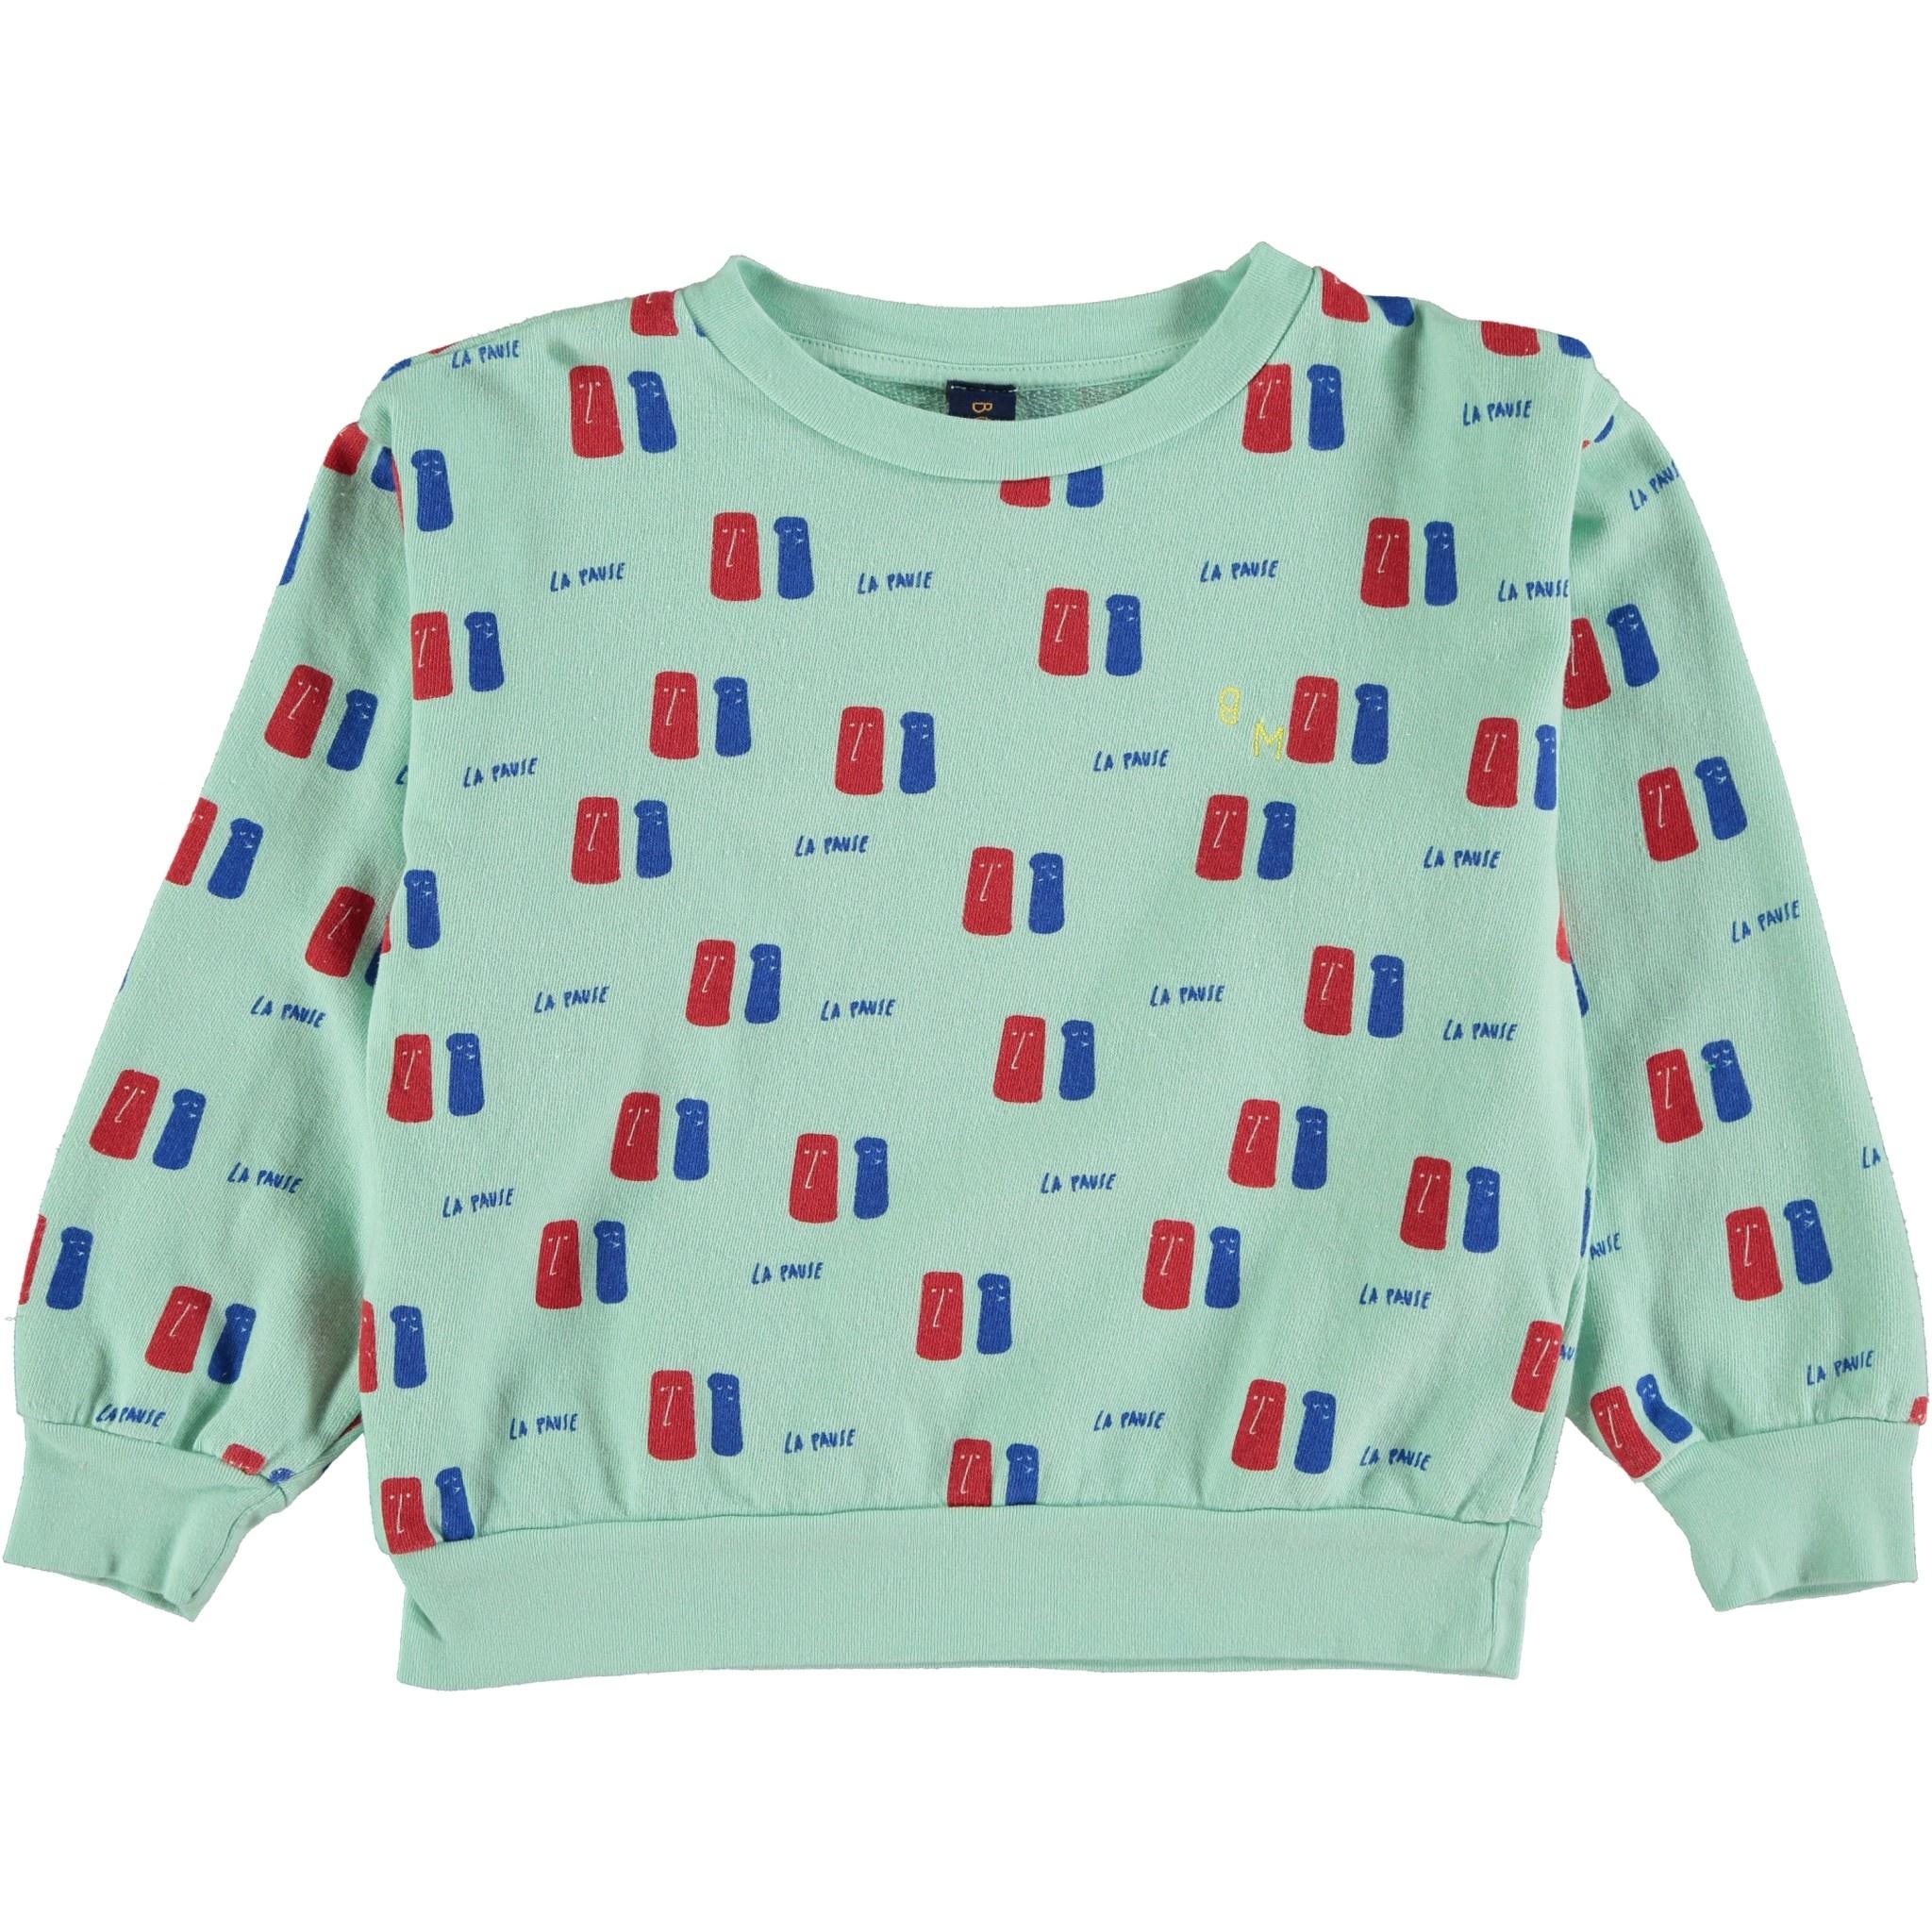 Sweatshirt la pause dusty aqua-1